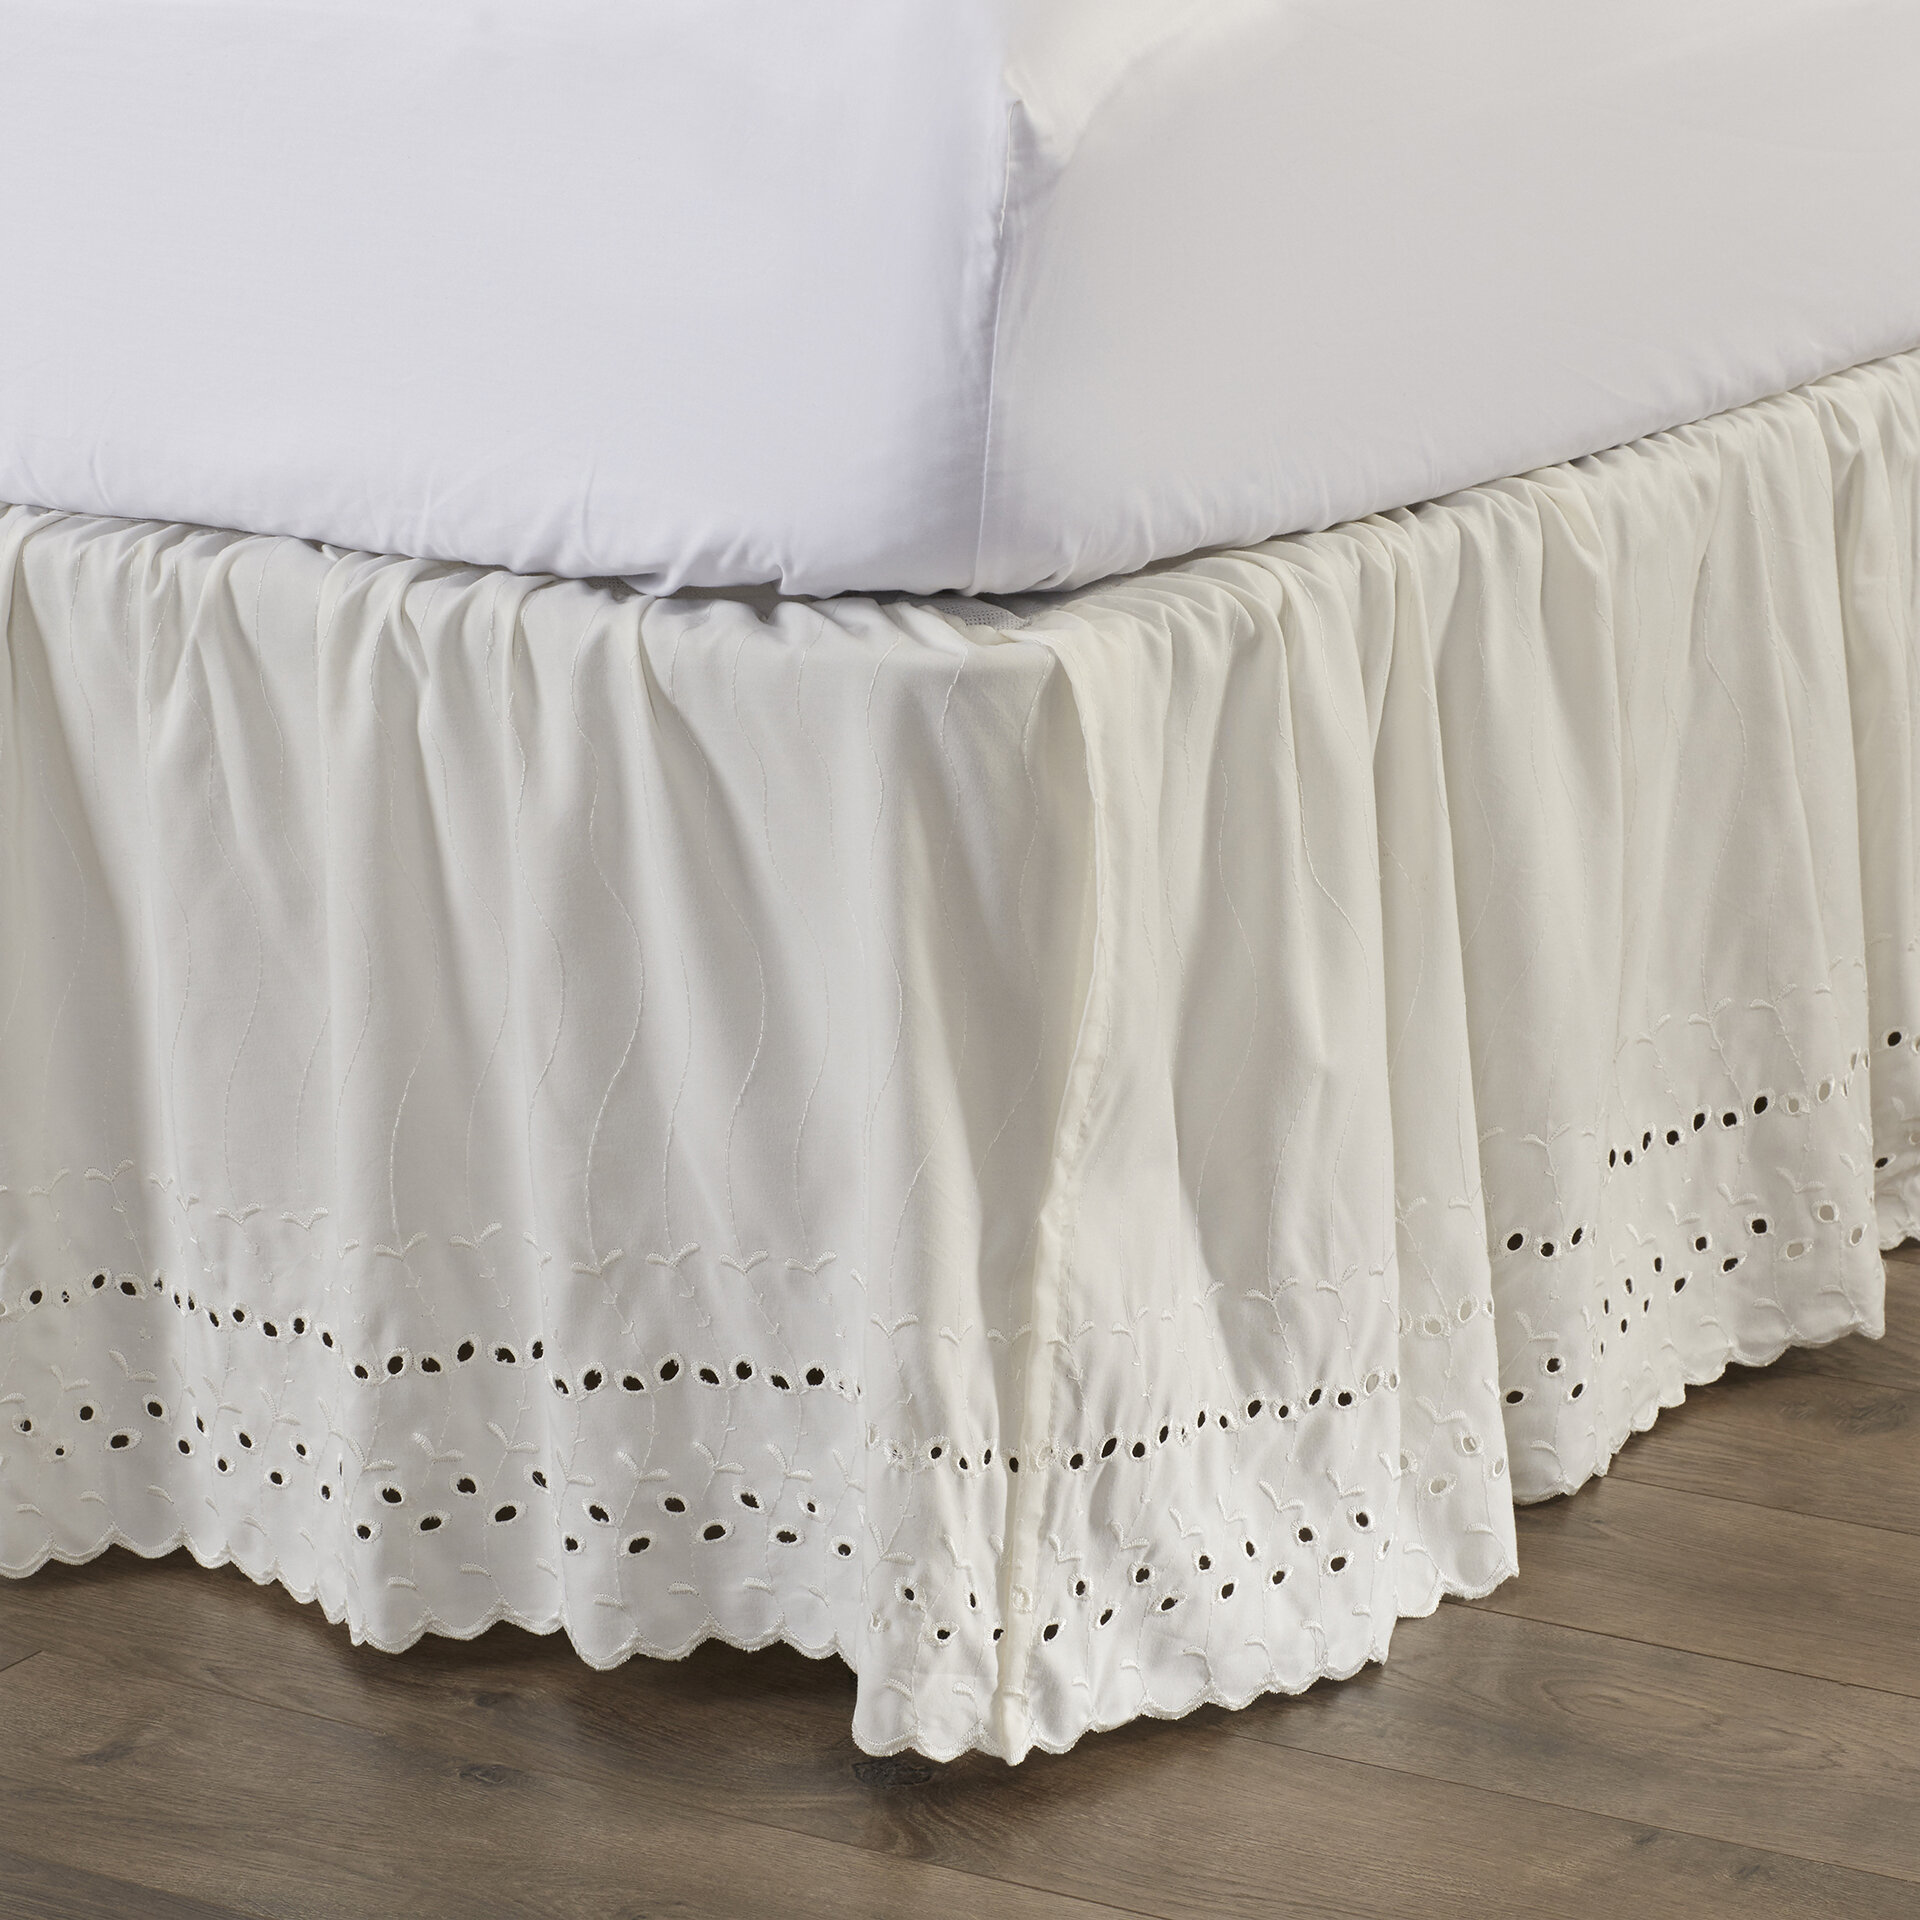 Ophelia Co Dakota Eyelet Extra Long 145 Thread Count 18 Bed